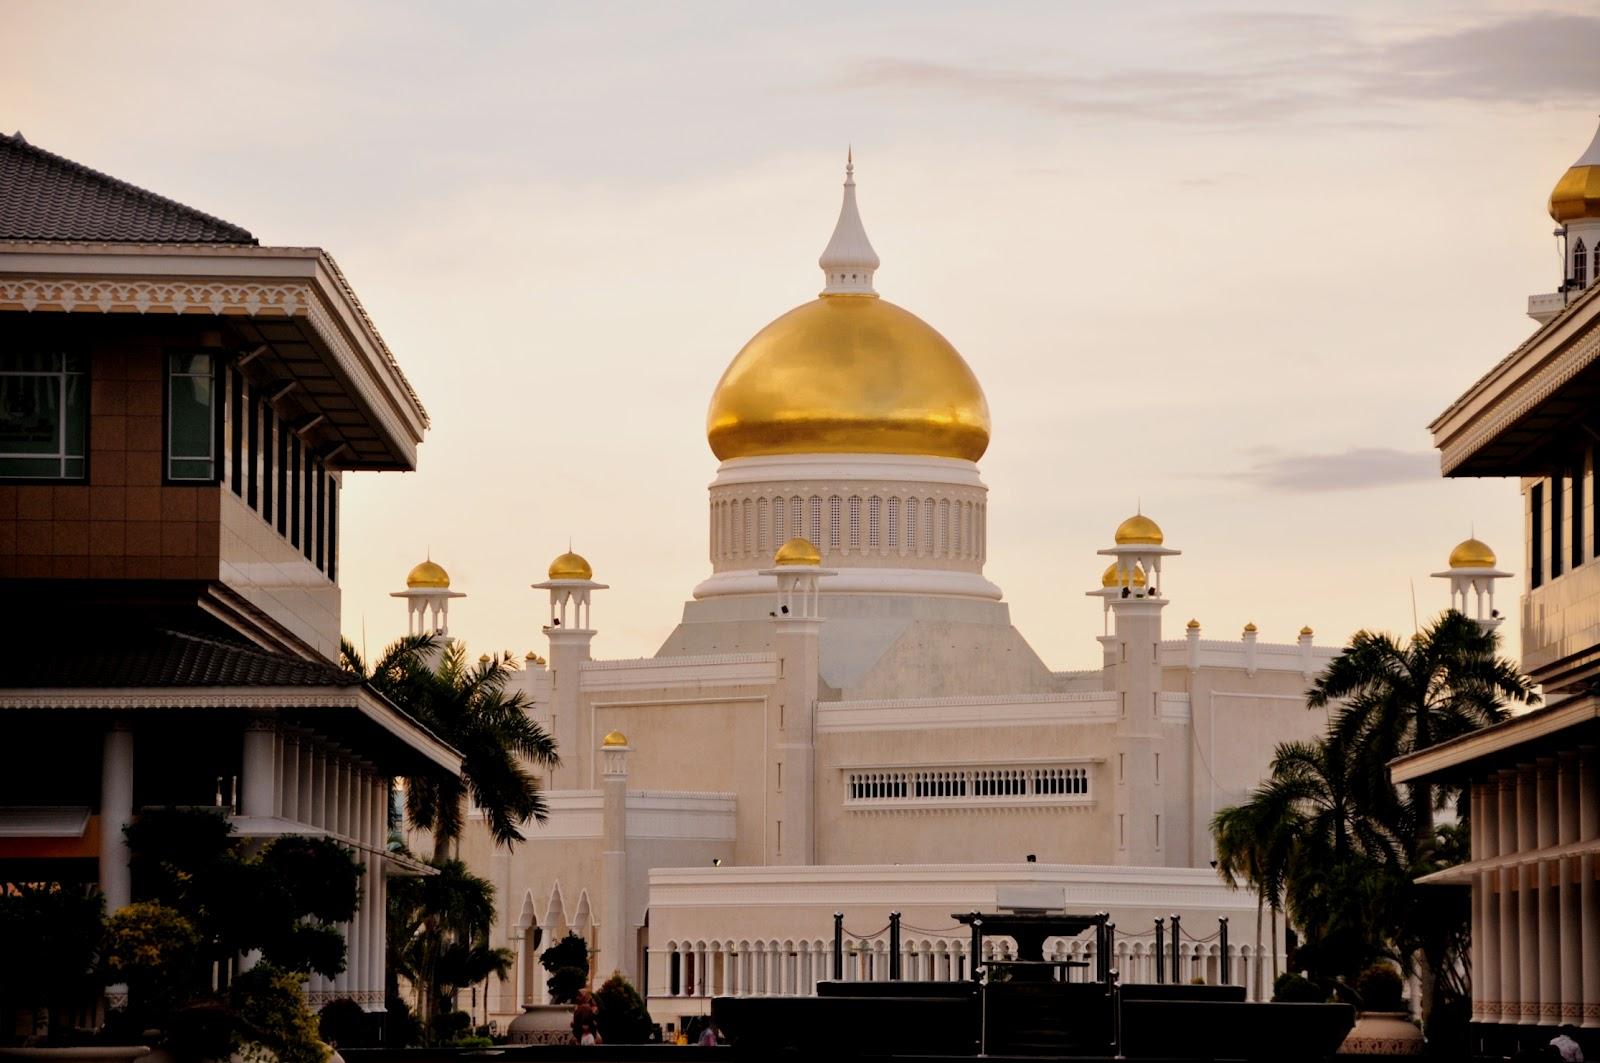 Kuala Belait, Brunei Darussalam | Kuala Belait, Brunei ... |Kuala Belait People